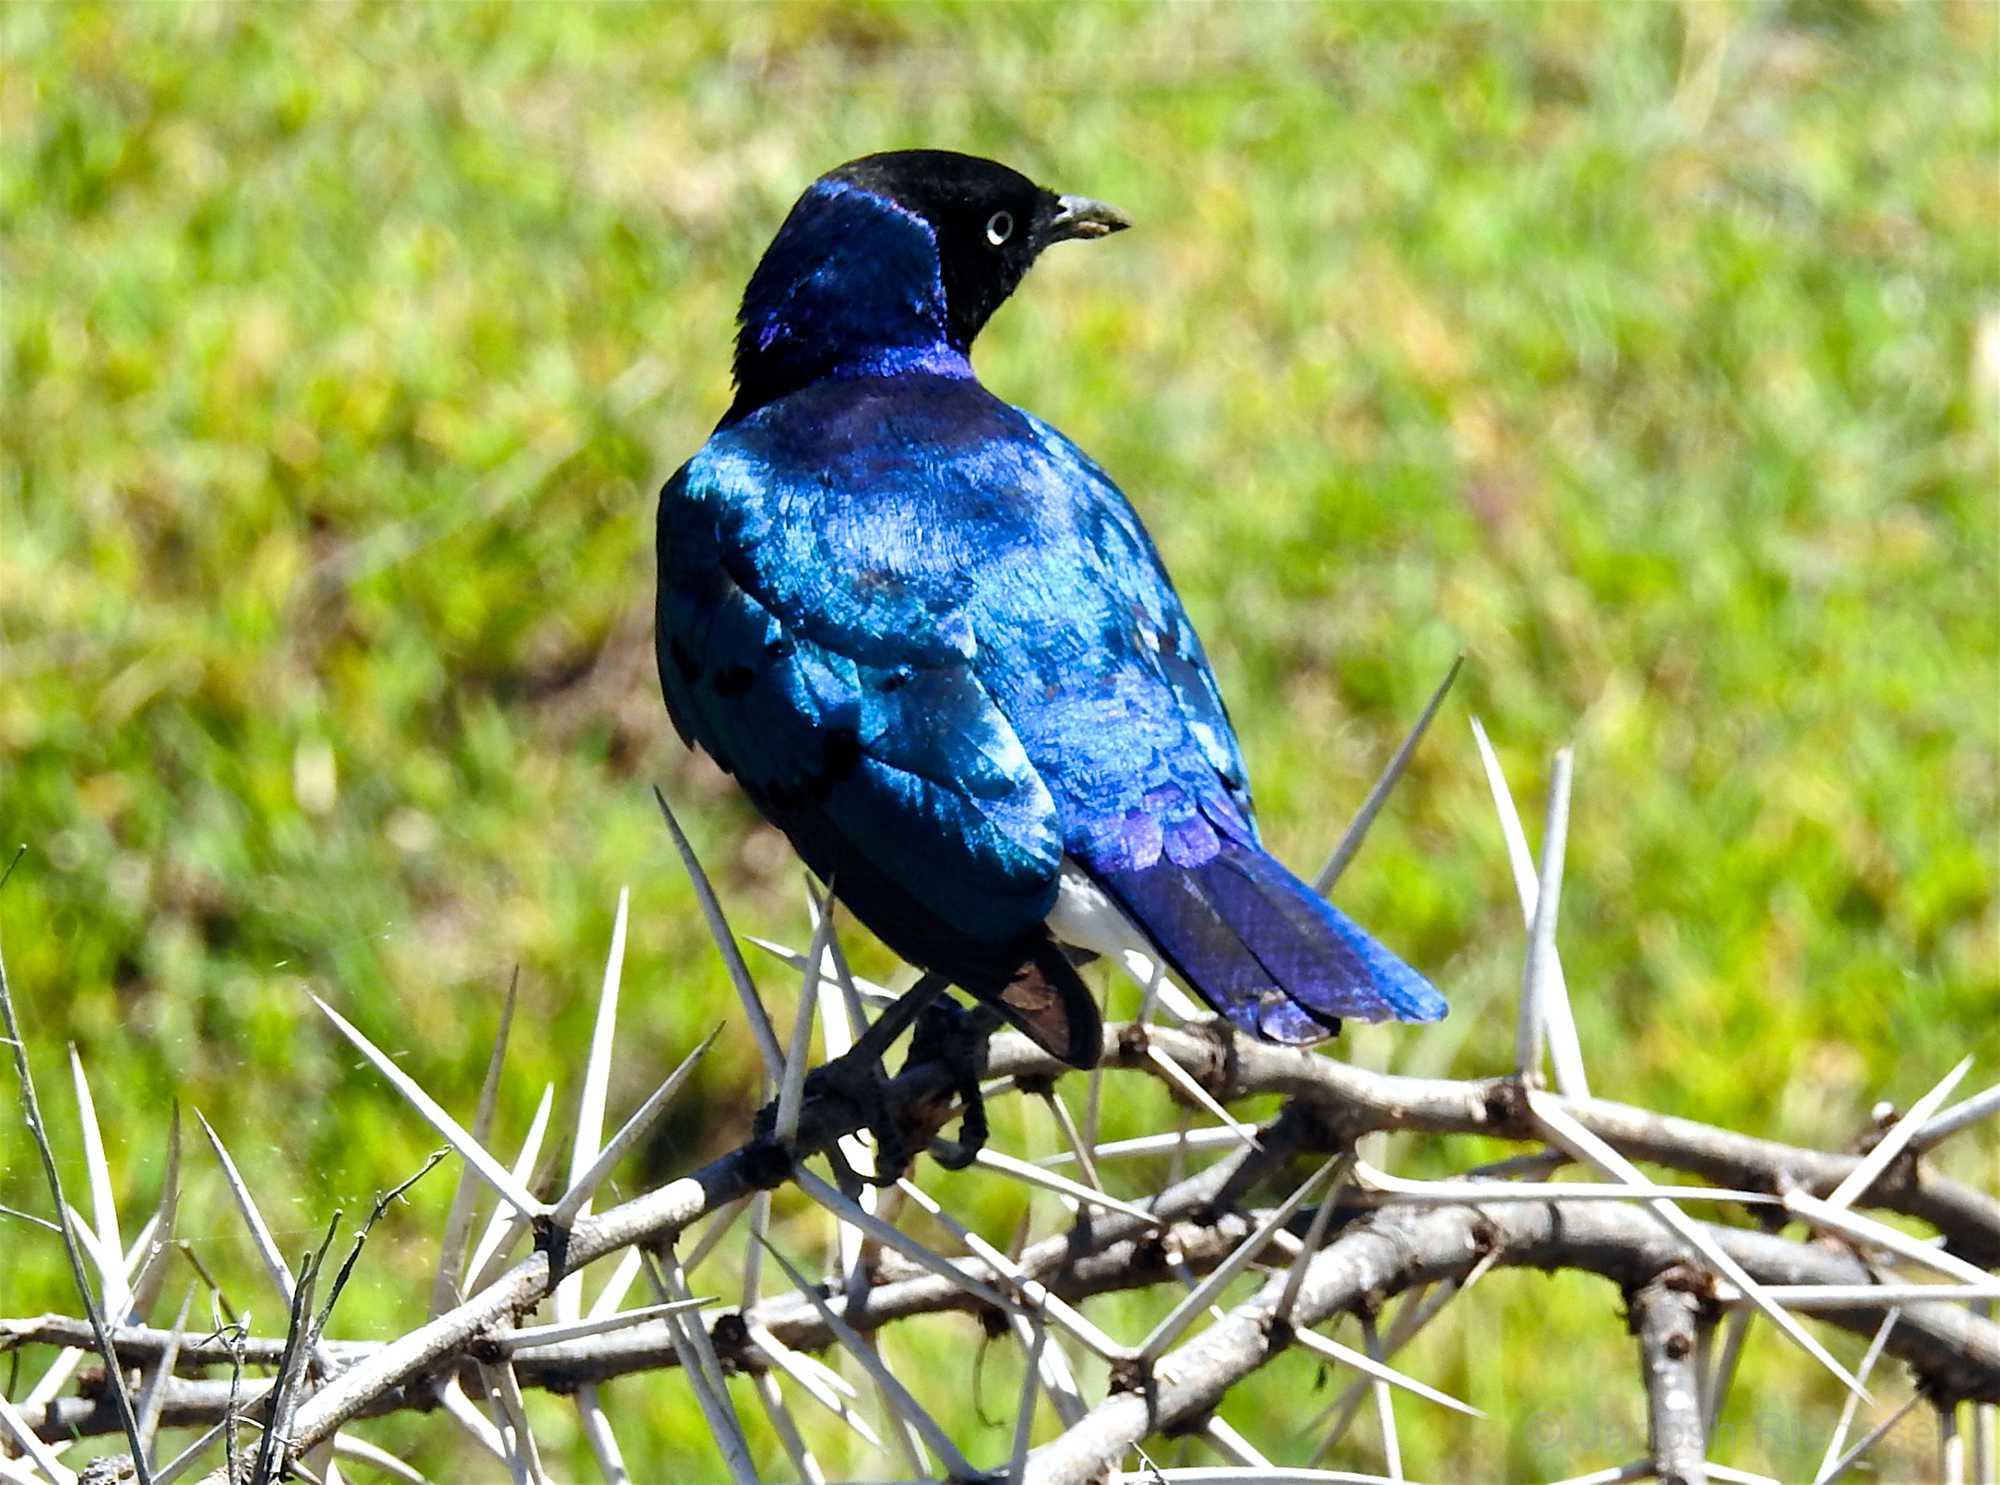 Tanzania Superb Starling